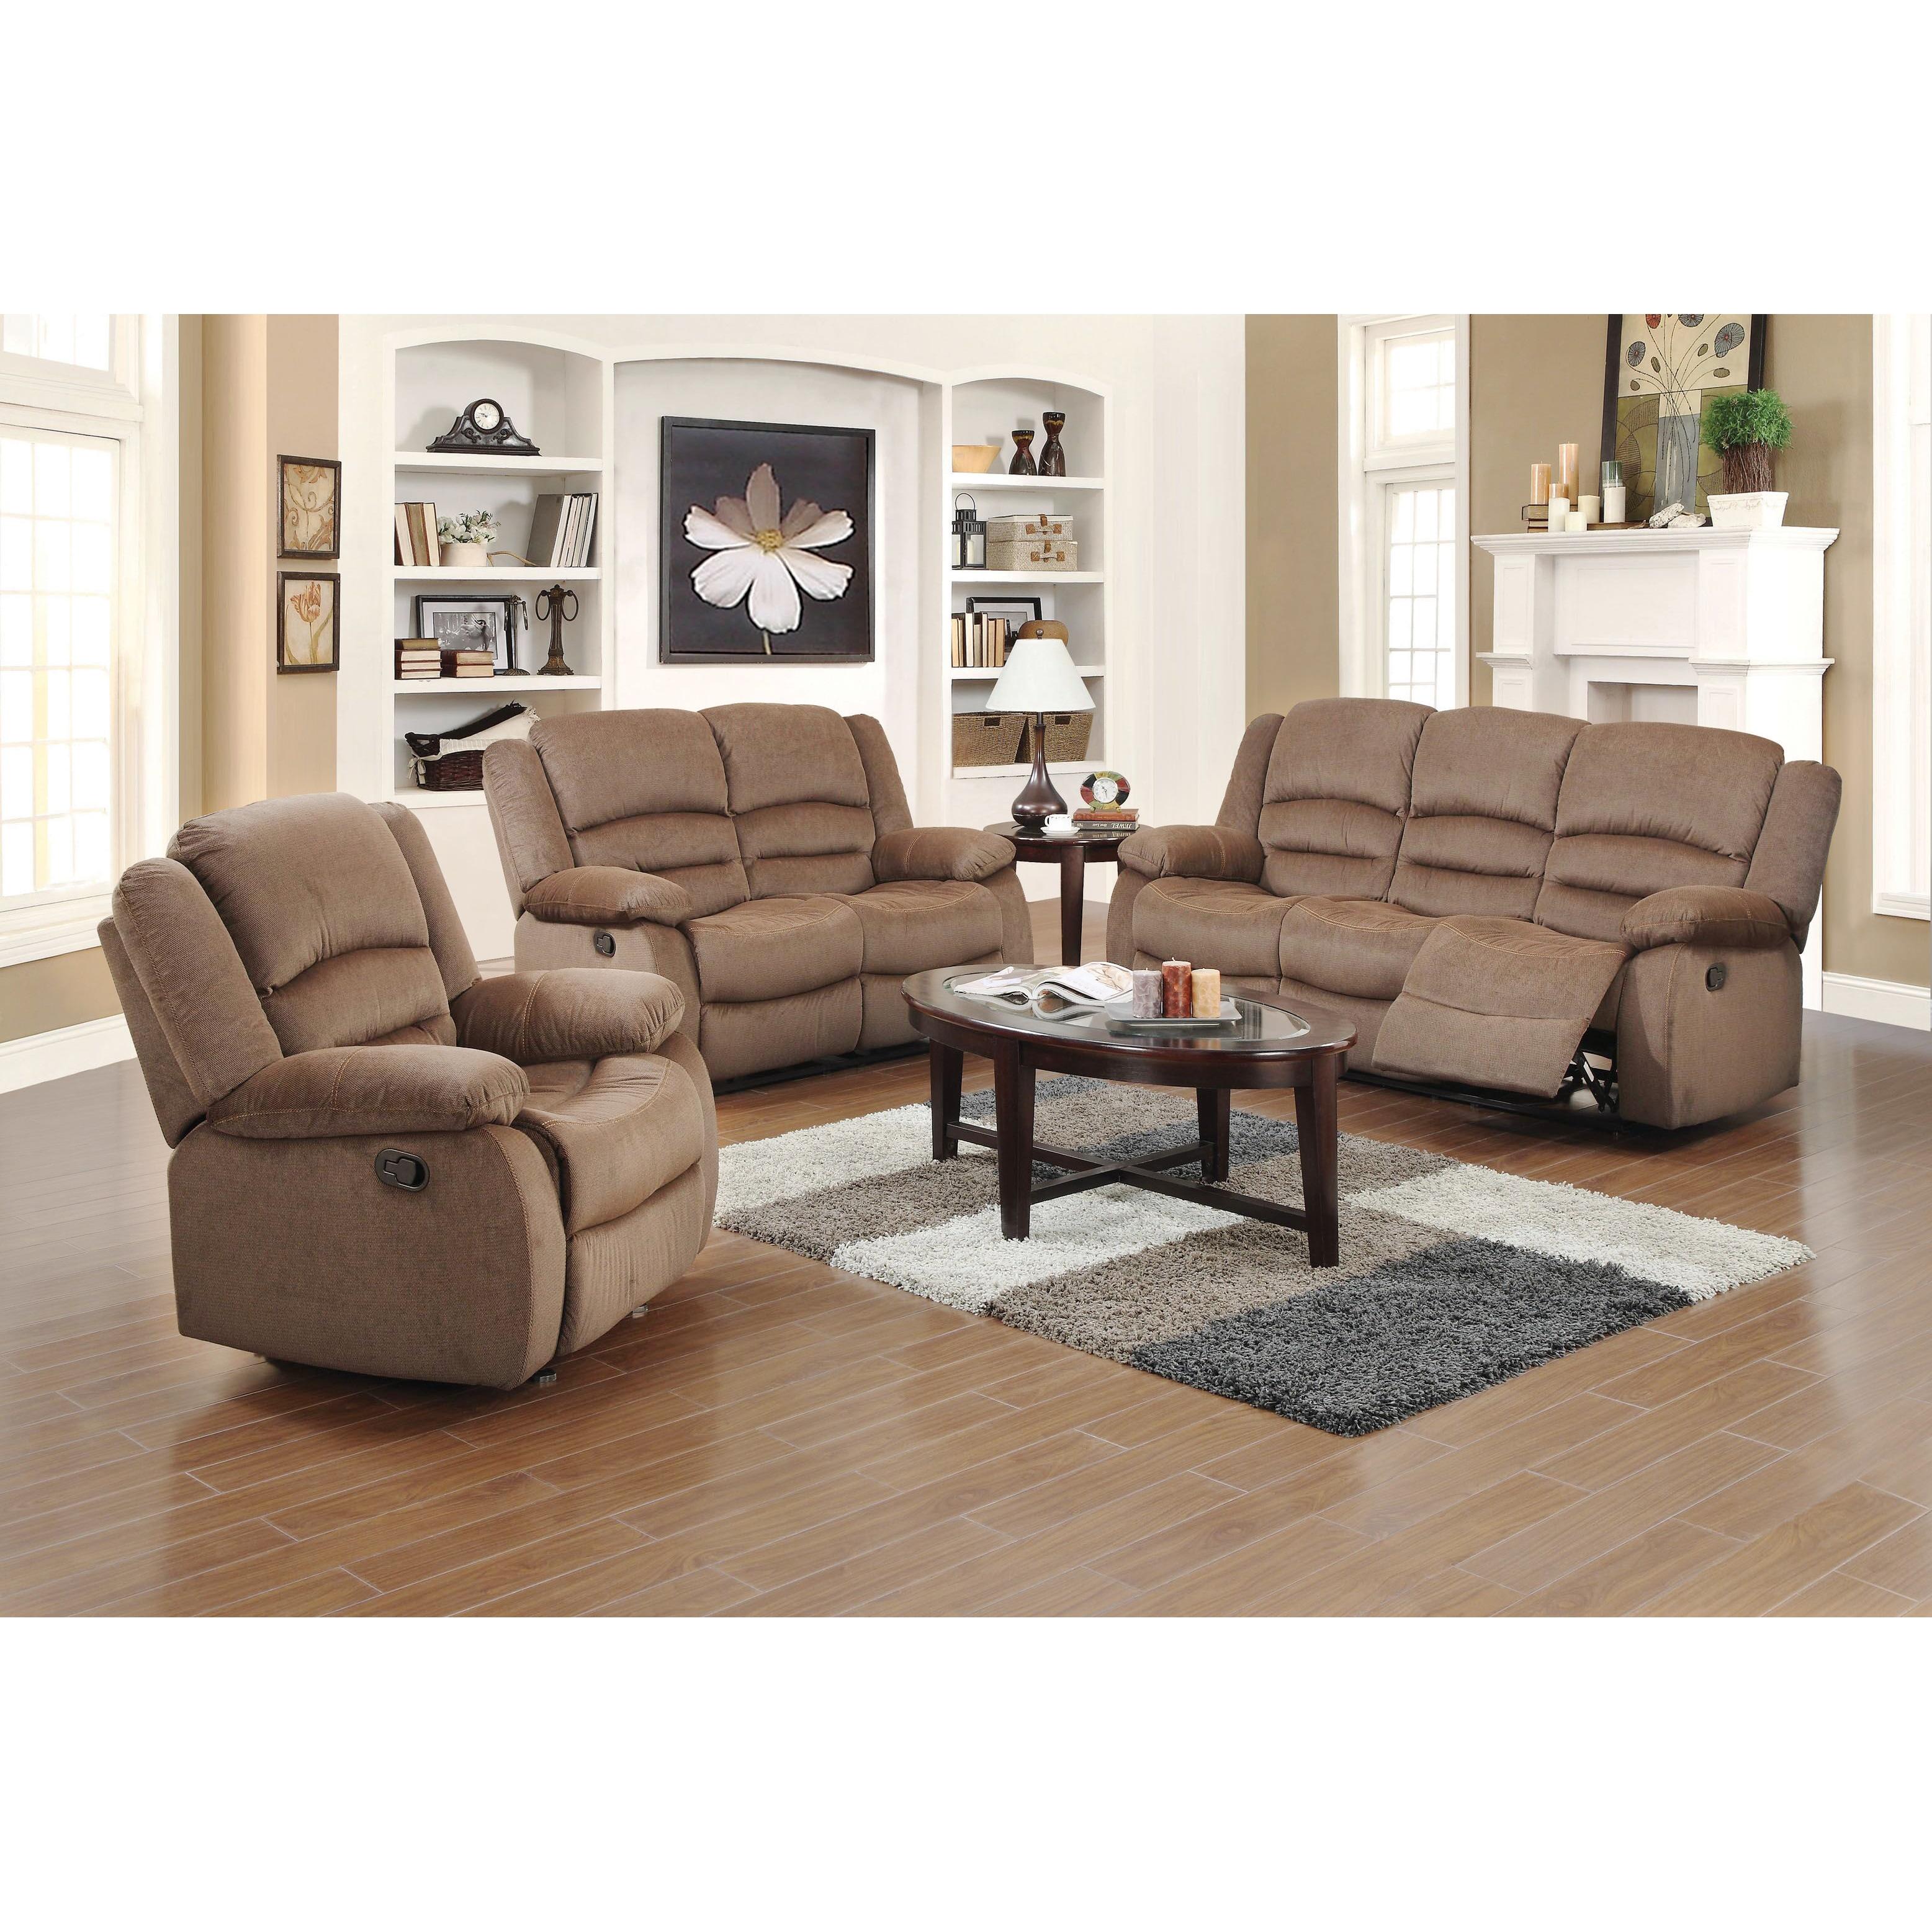 Dallas 3 Piece Fabric Reclining Sofa Set Free Shipping Today 10996731